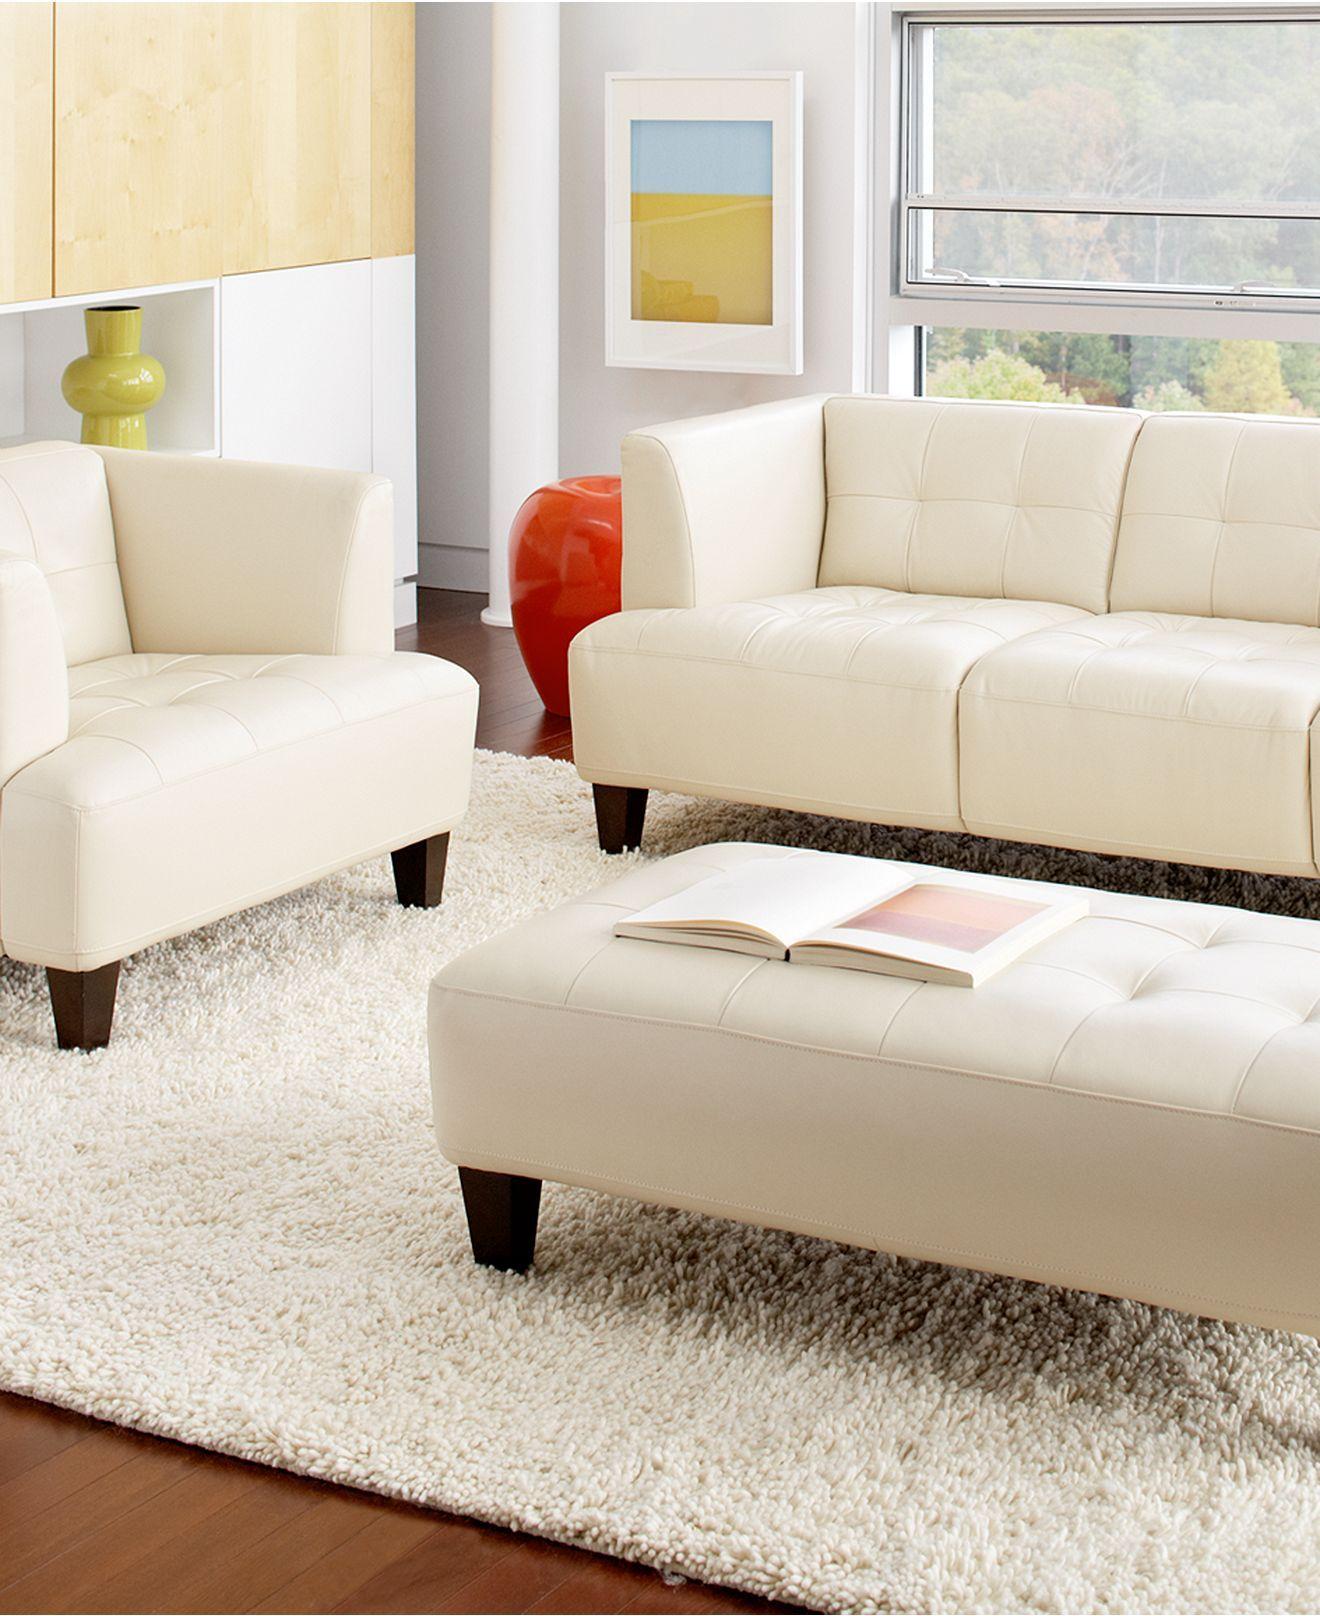 Alessia Leather Sofa Living Room Furniture Sets & Pieces ...